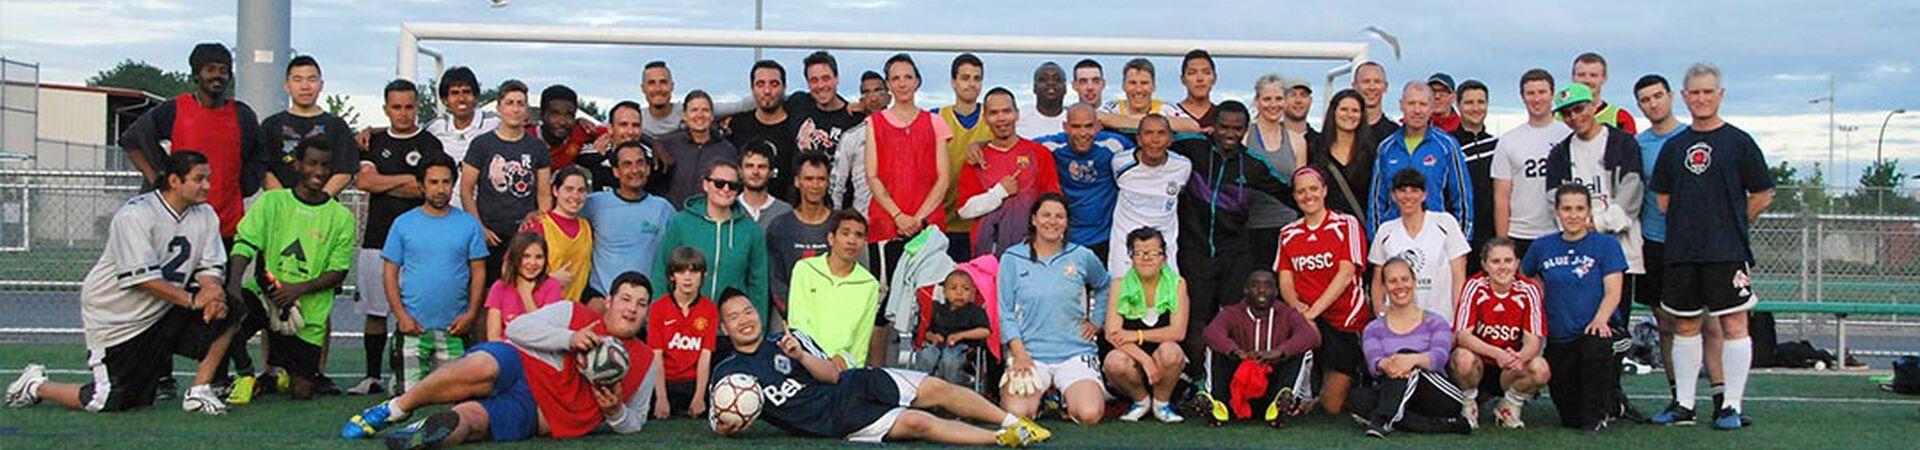 Banner - Vancouver Street Soccer League